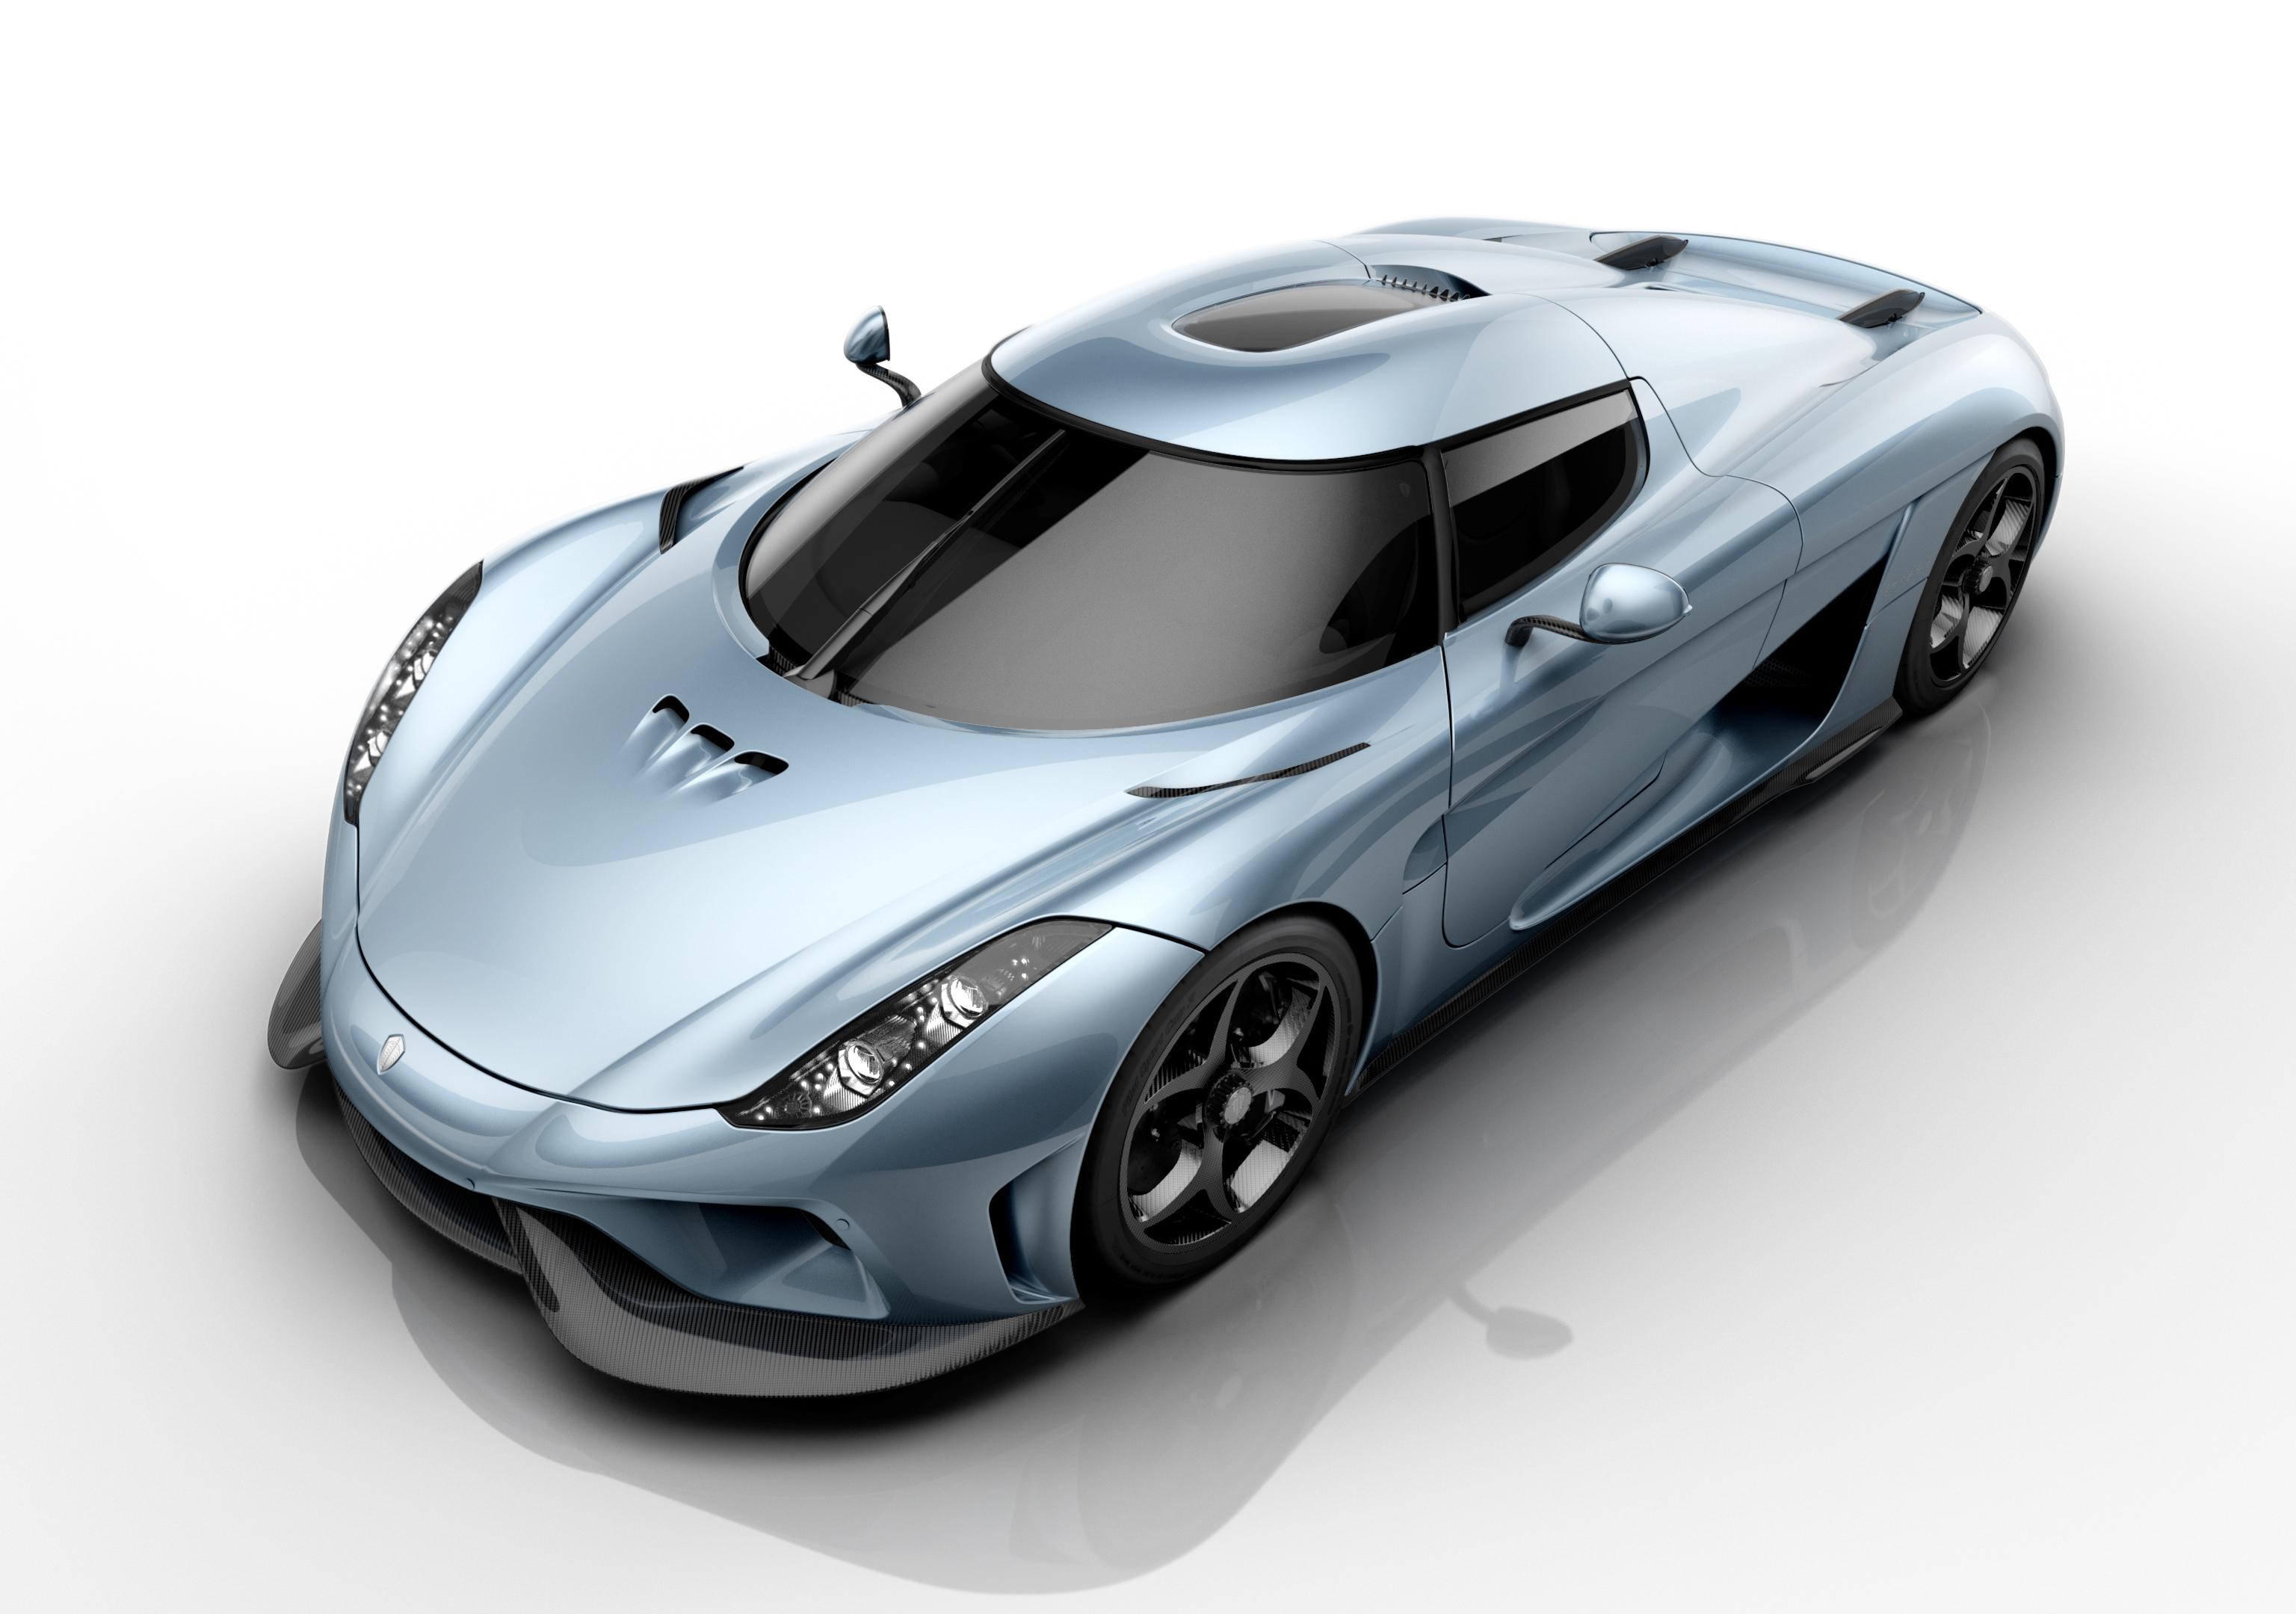 Koengisegg_Regera_front_moretwist Fascinating Bugatti Veyron Grand Sport Vitesse 1/4 Mile Cars Trend